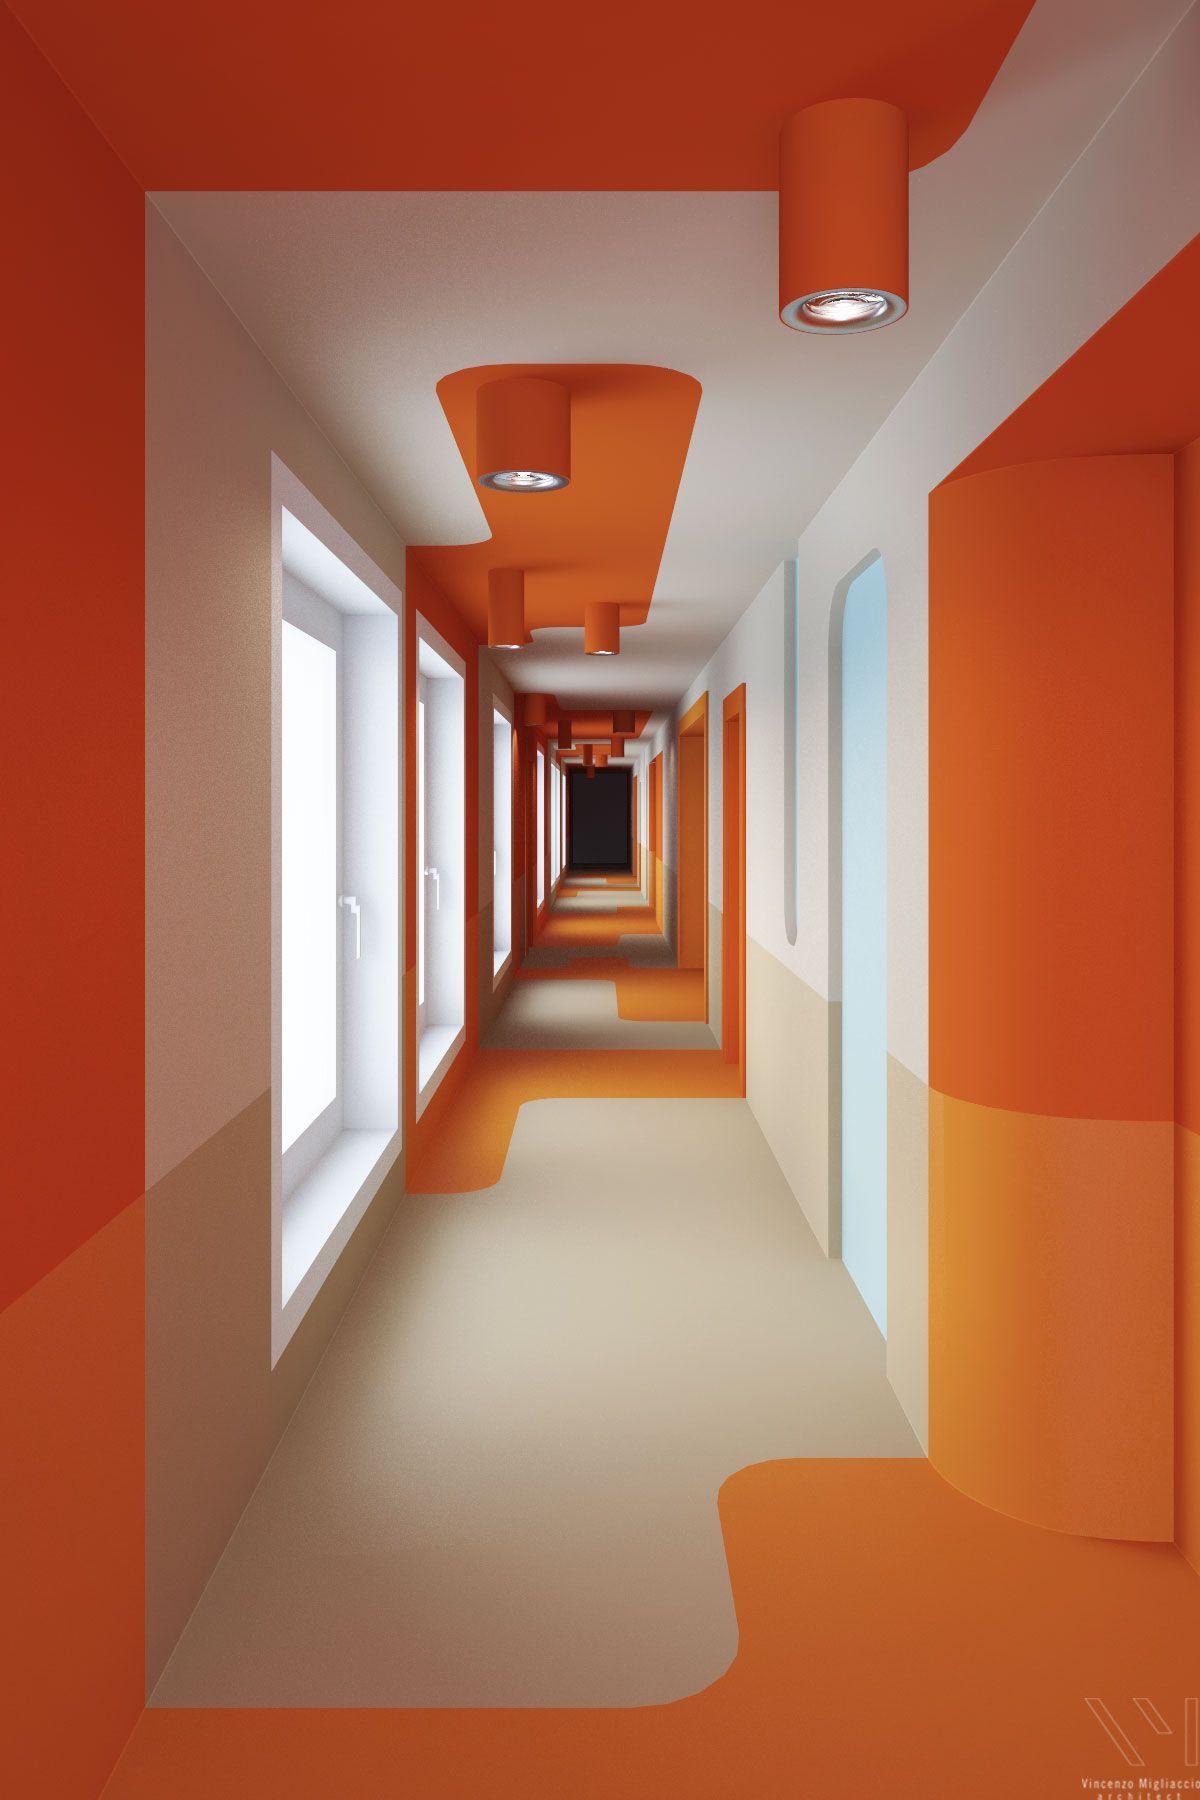 Corridor Design: Mixed Corridor - Vincenzo Migliaccio